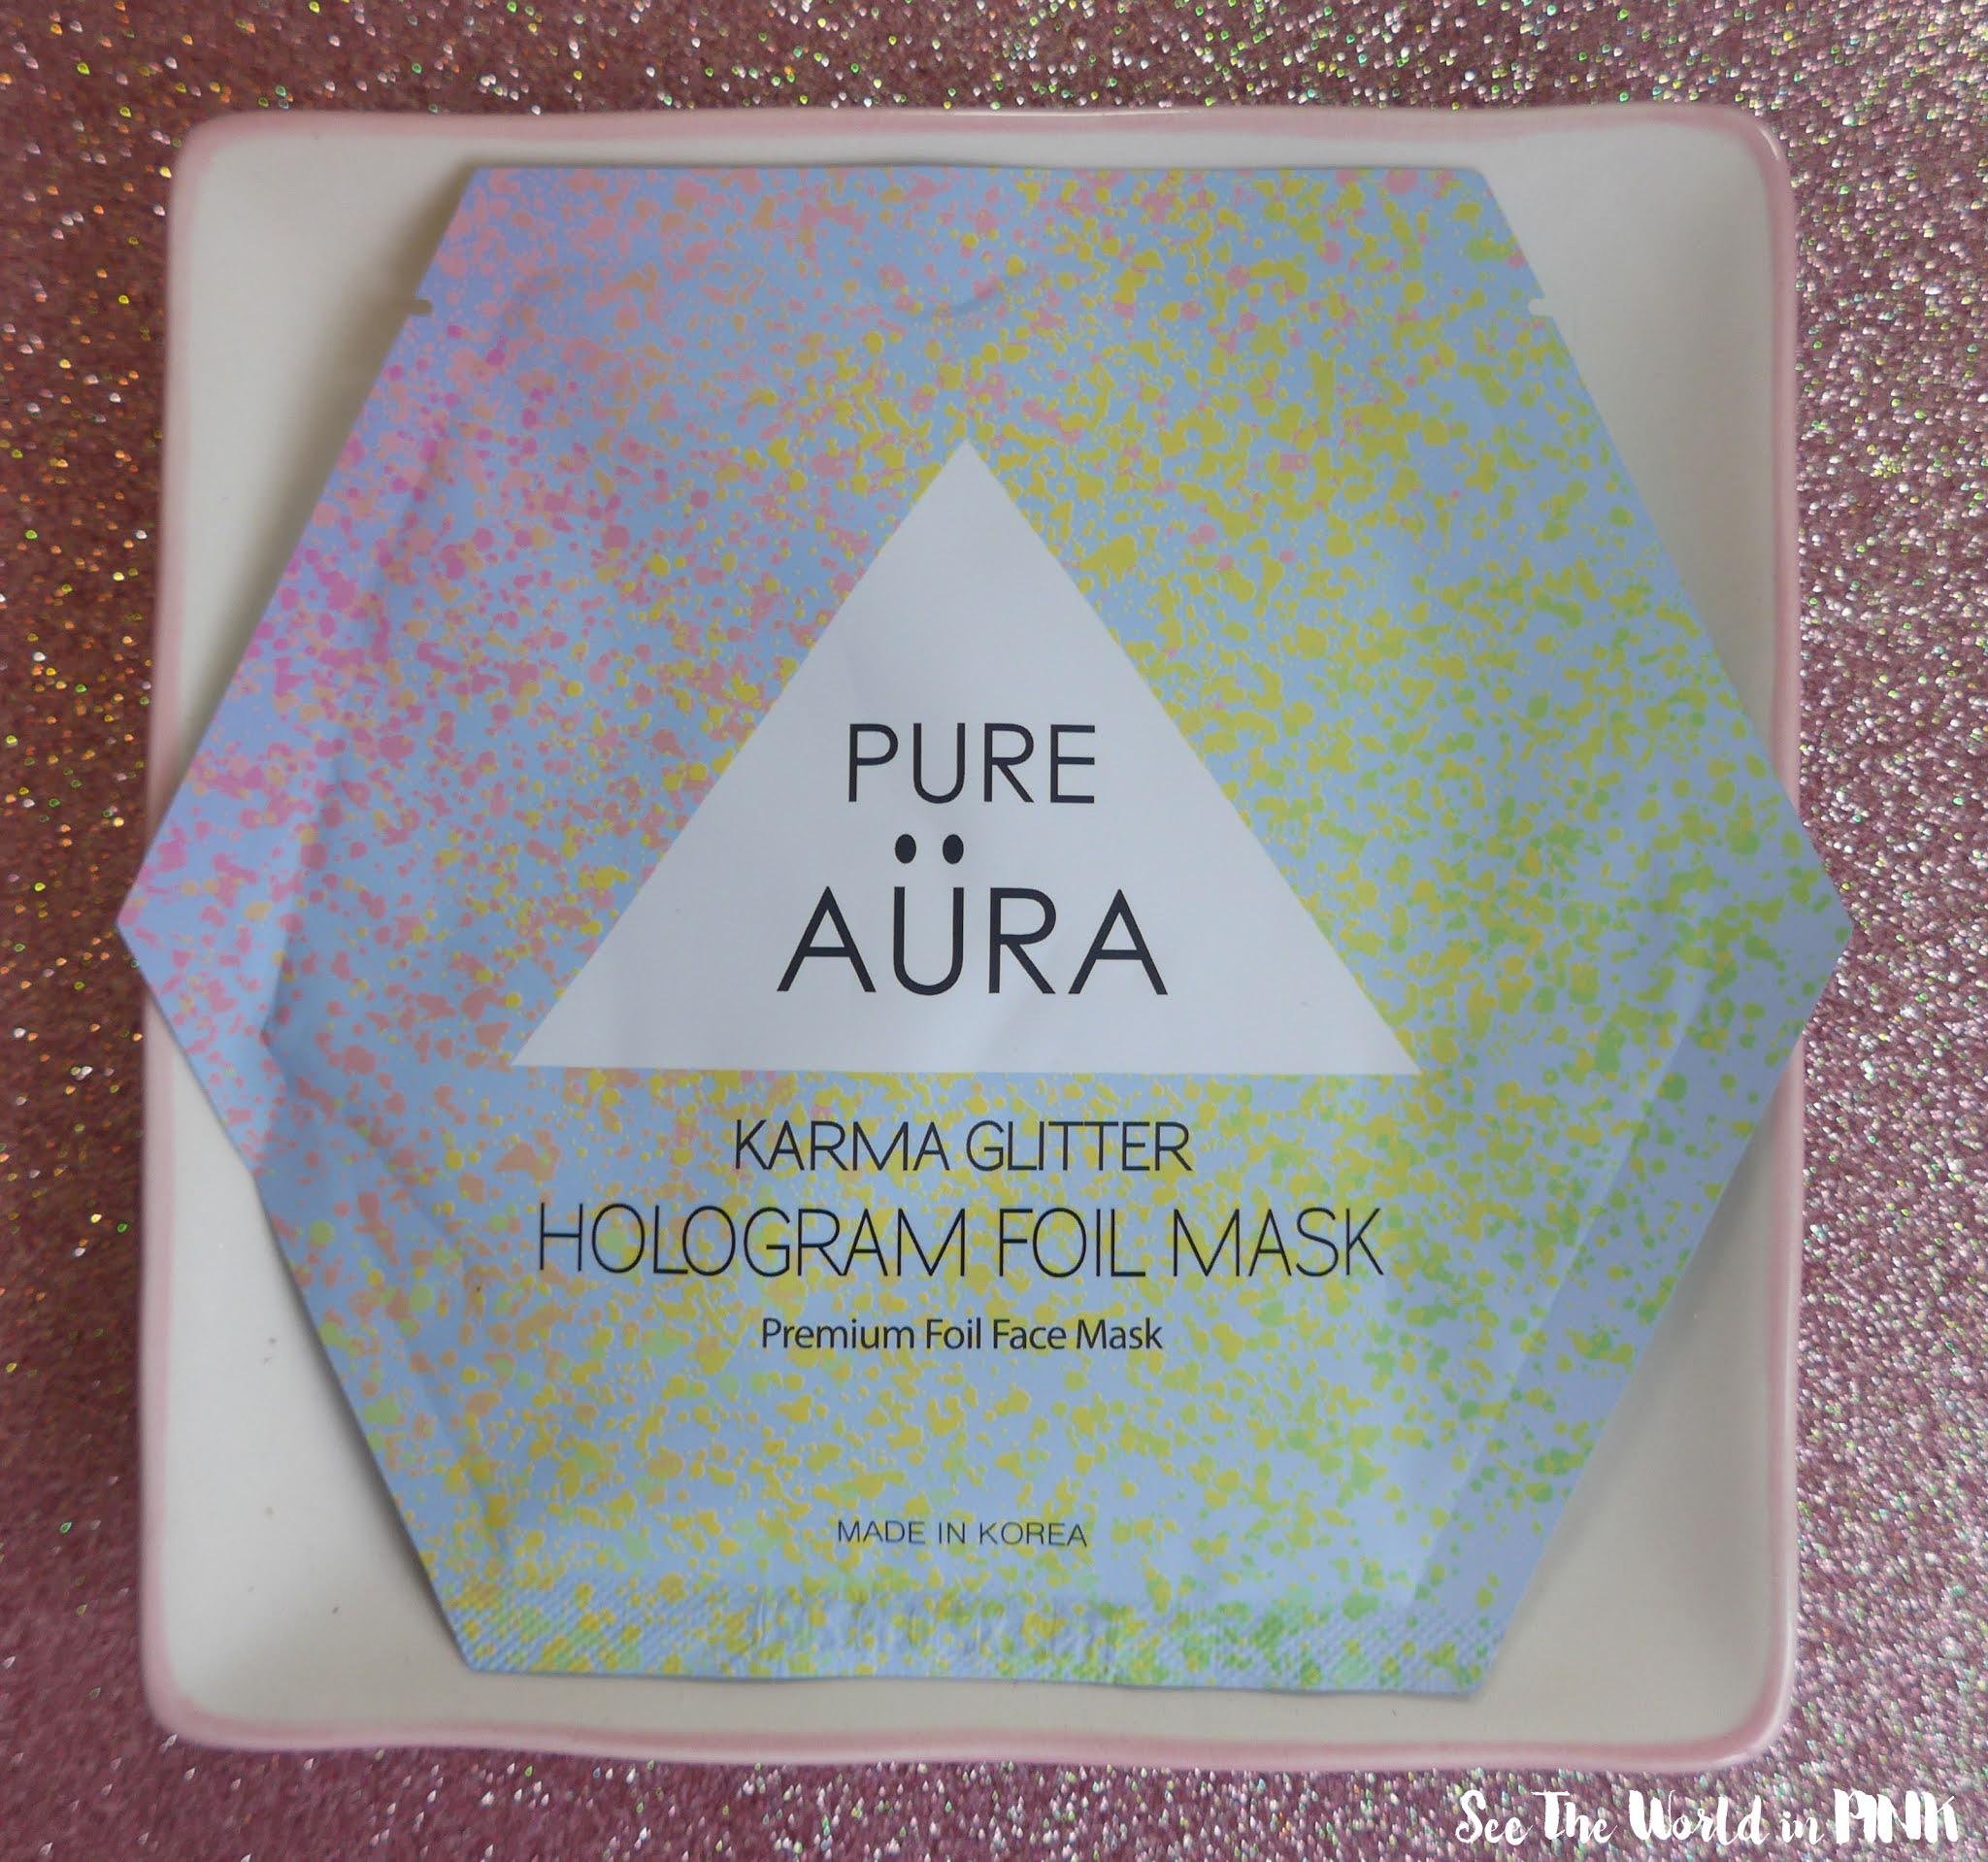 Mask Wednesday - Pure Aura Karma Glitter Hologram Foil Sheet Mask